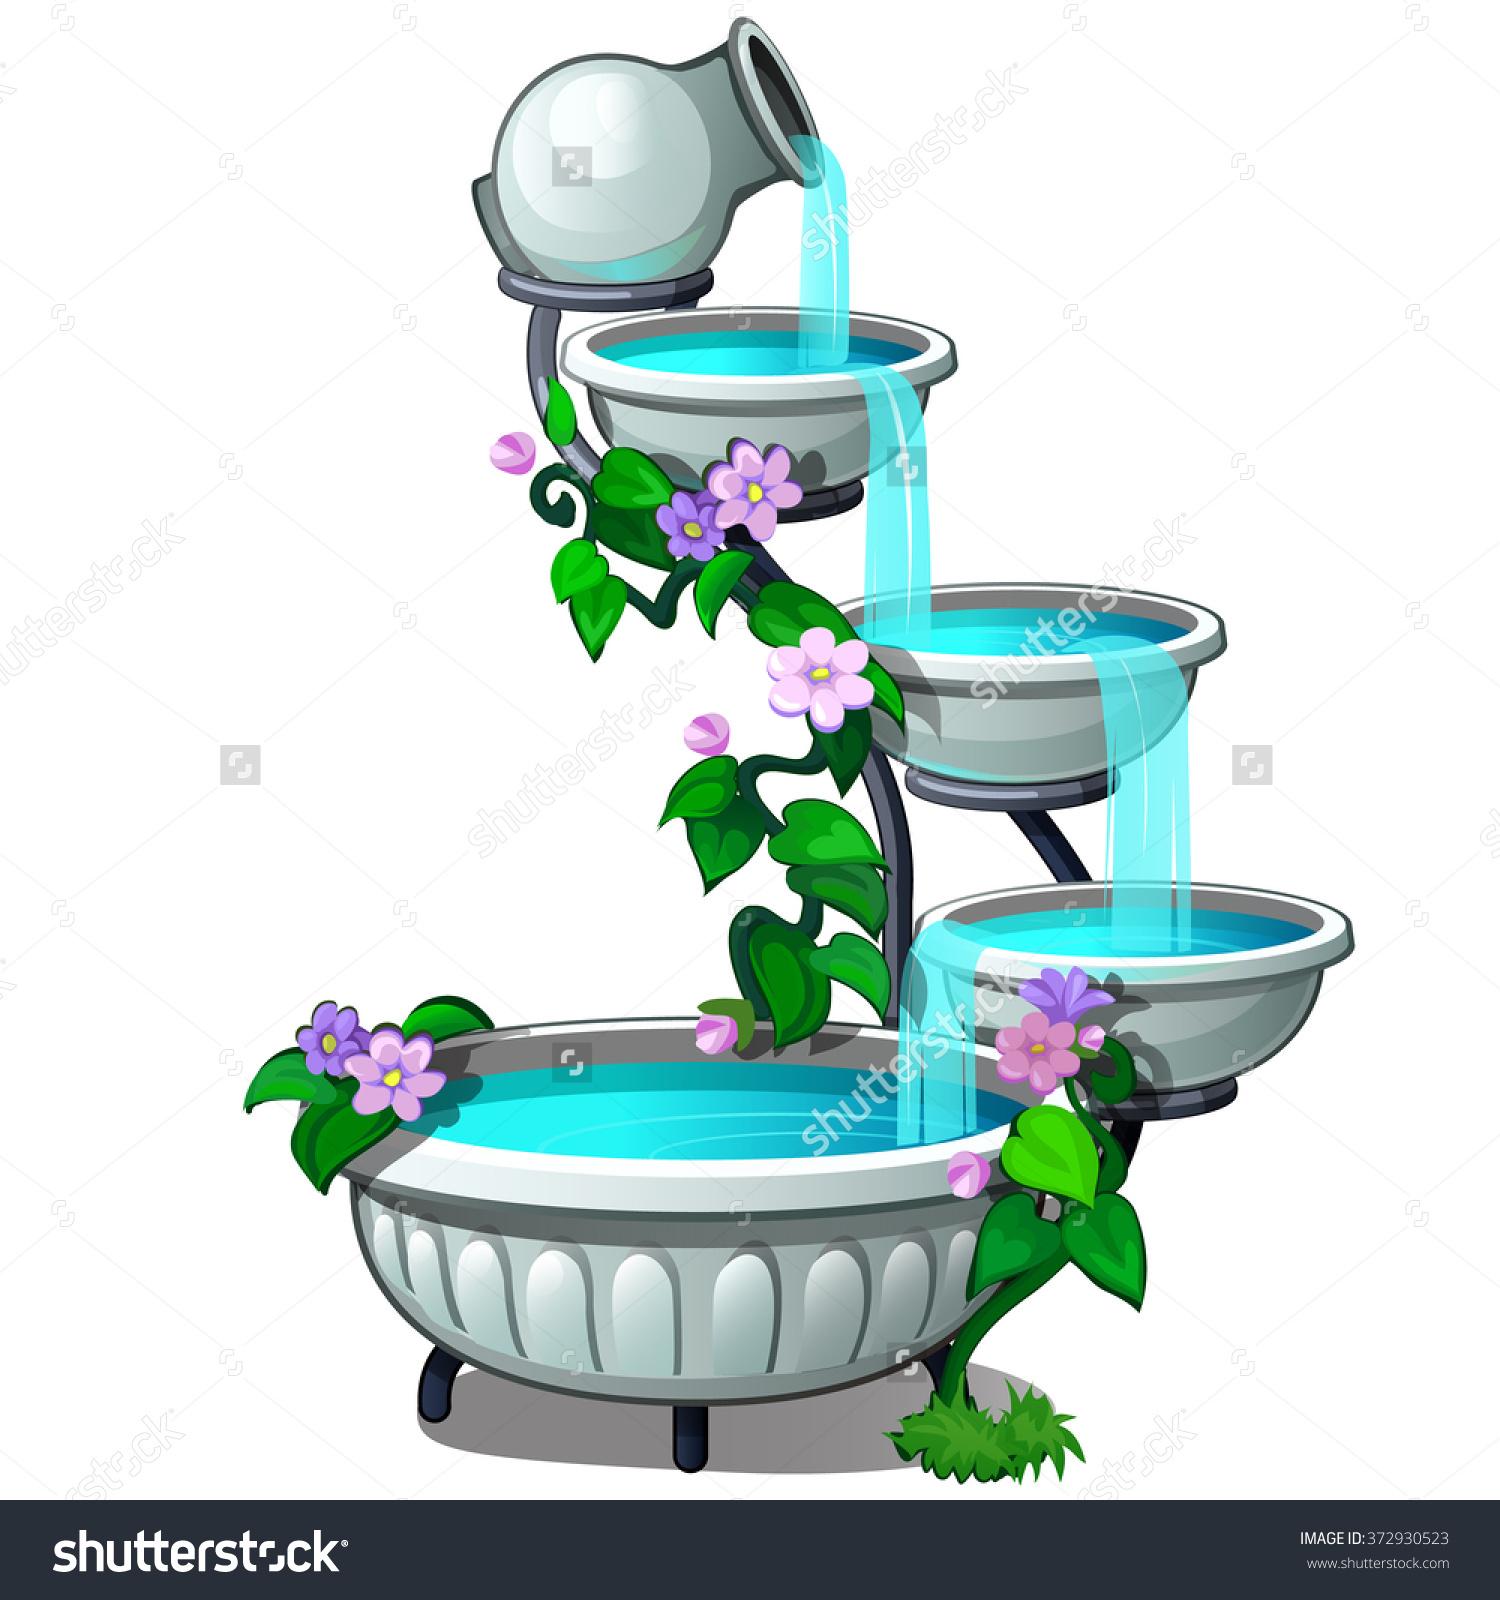 Tiered Fountain Vector Stock Vector 372930523.